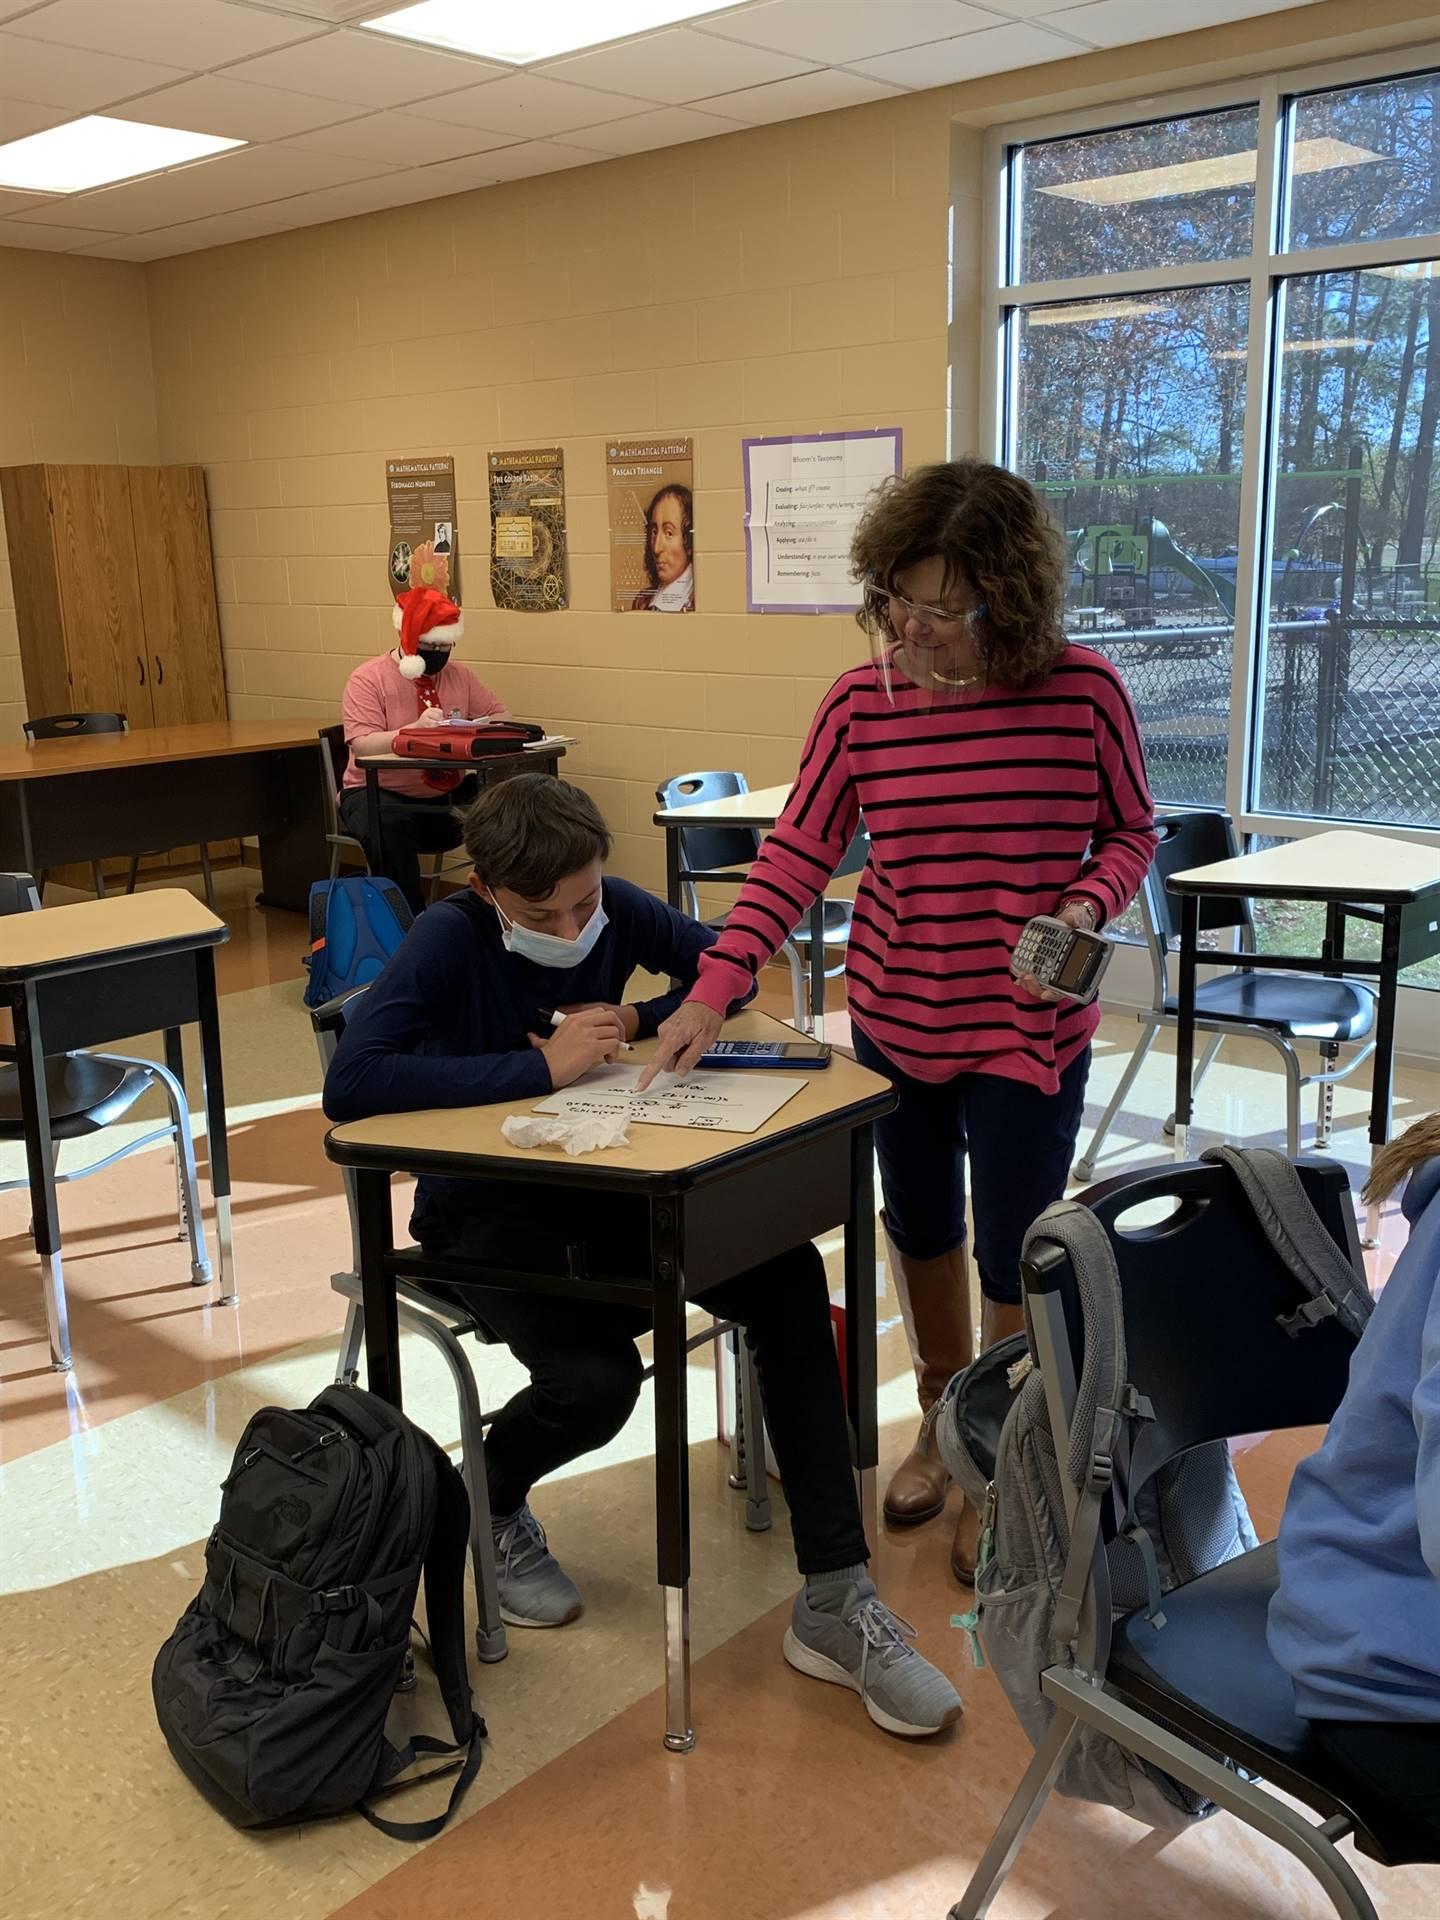 Teacher assisting student